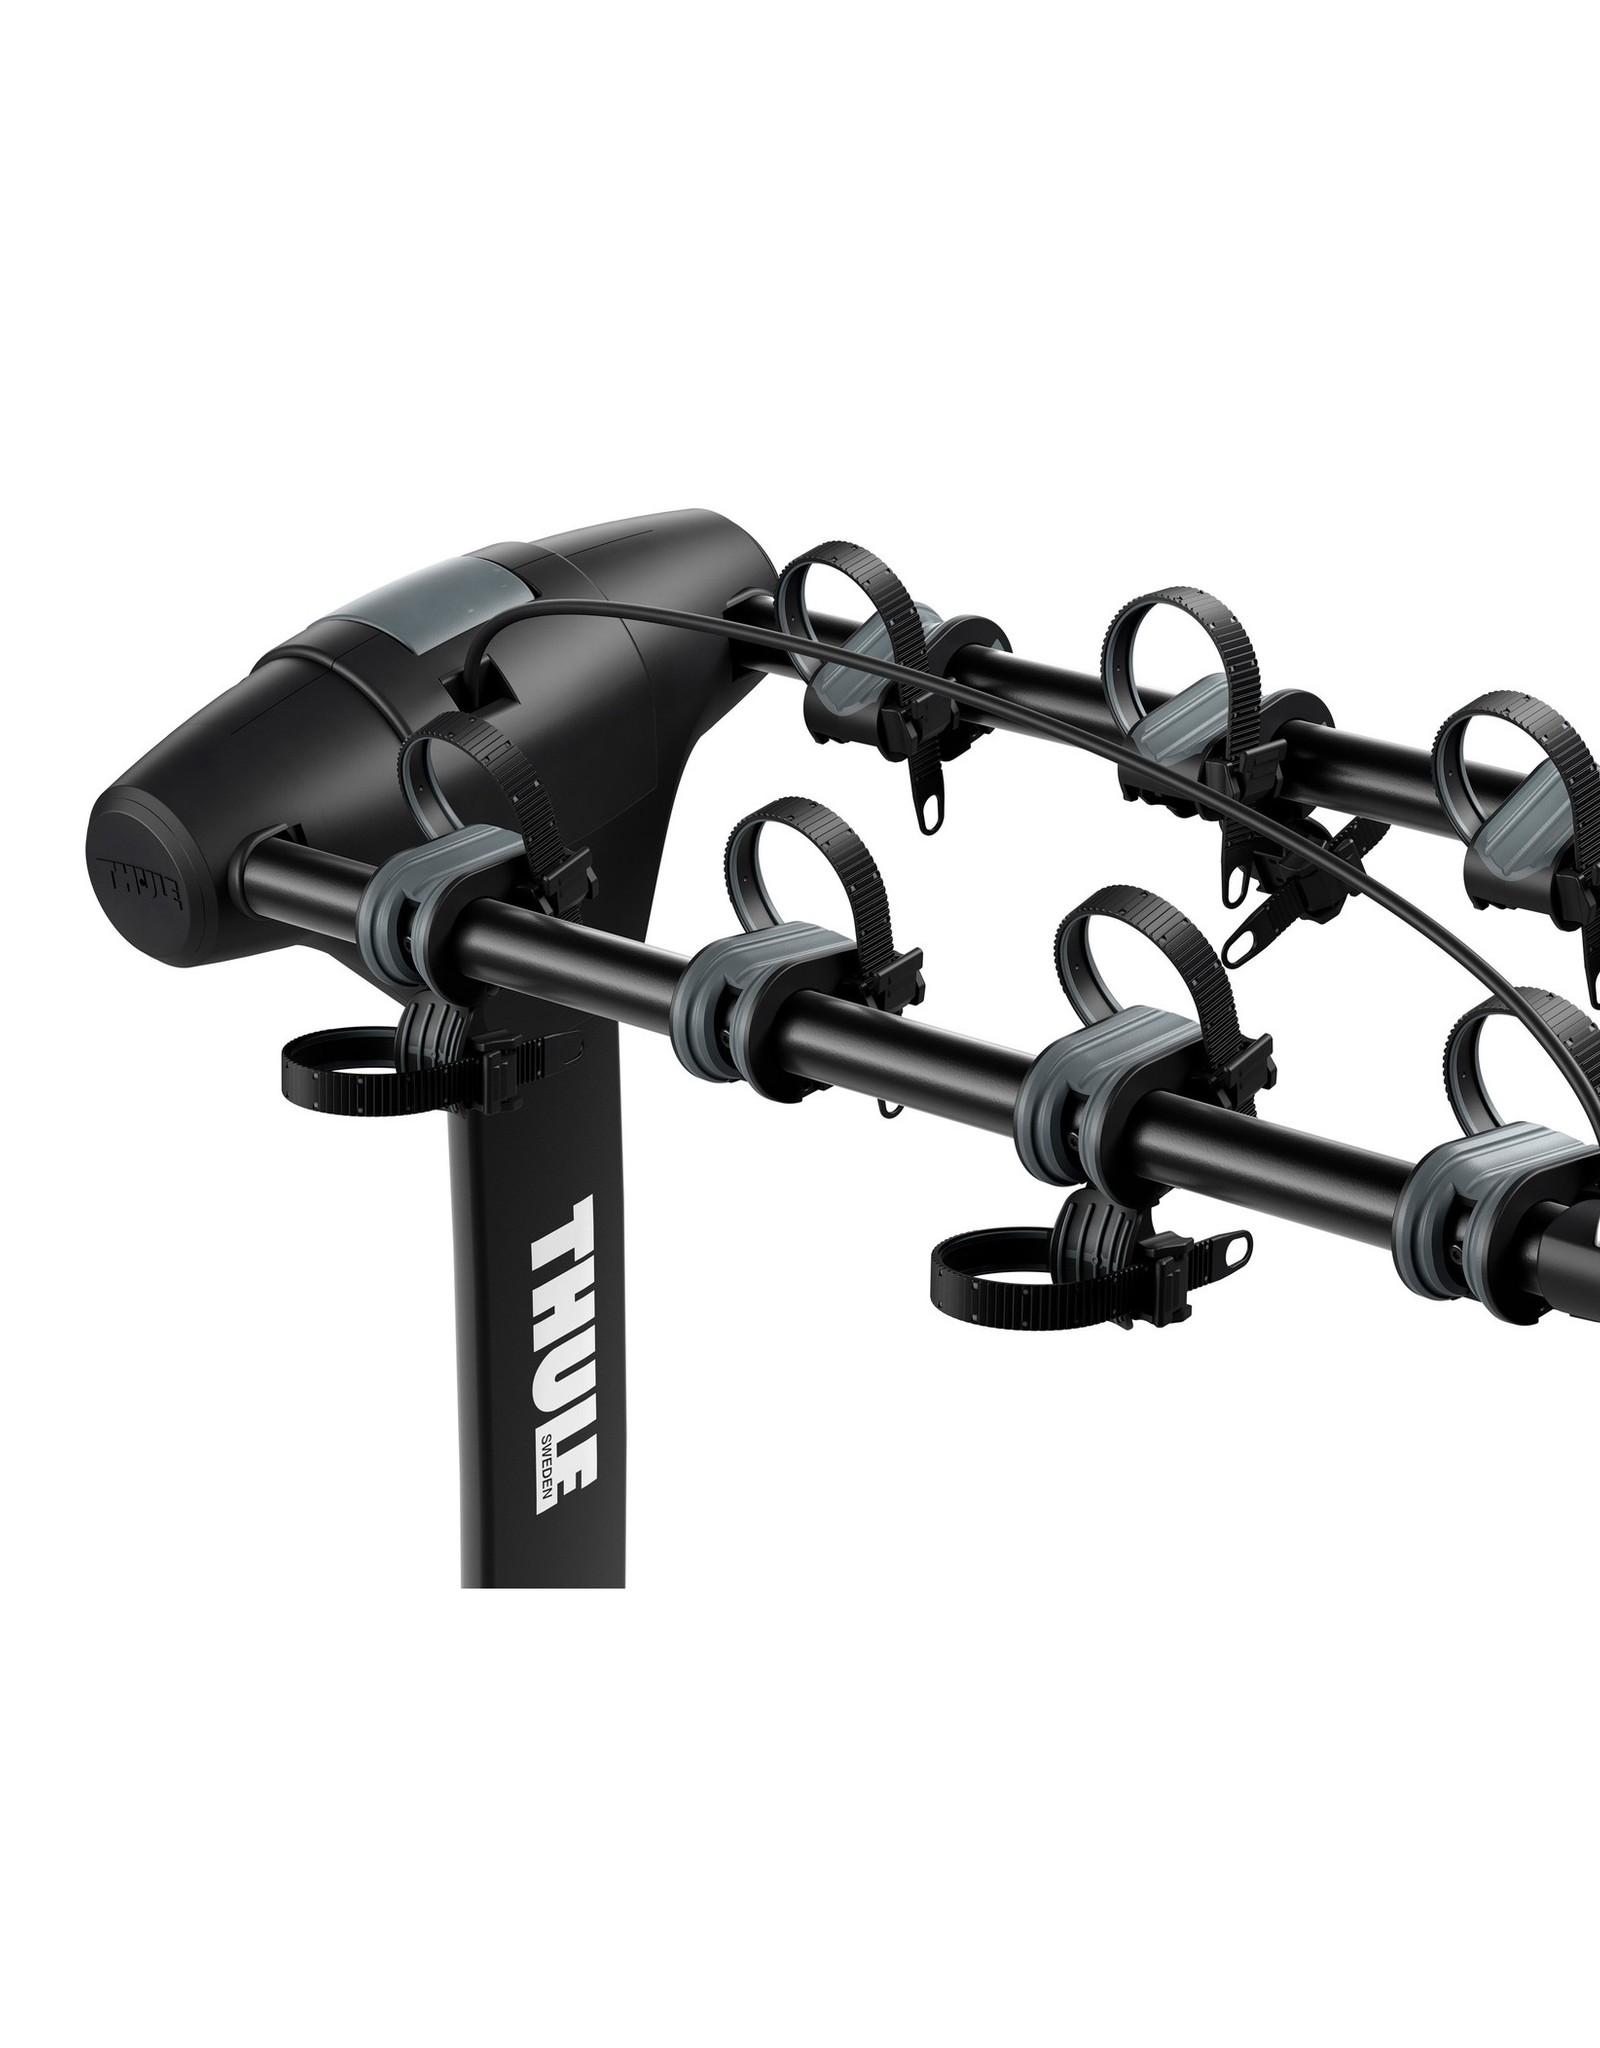 Car Rack - Thule Apex XT 4, Hitch System 4 bike rack